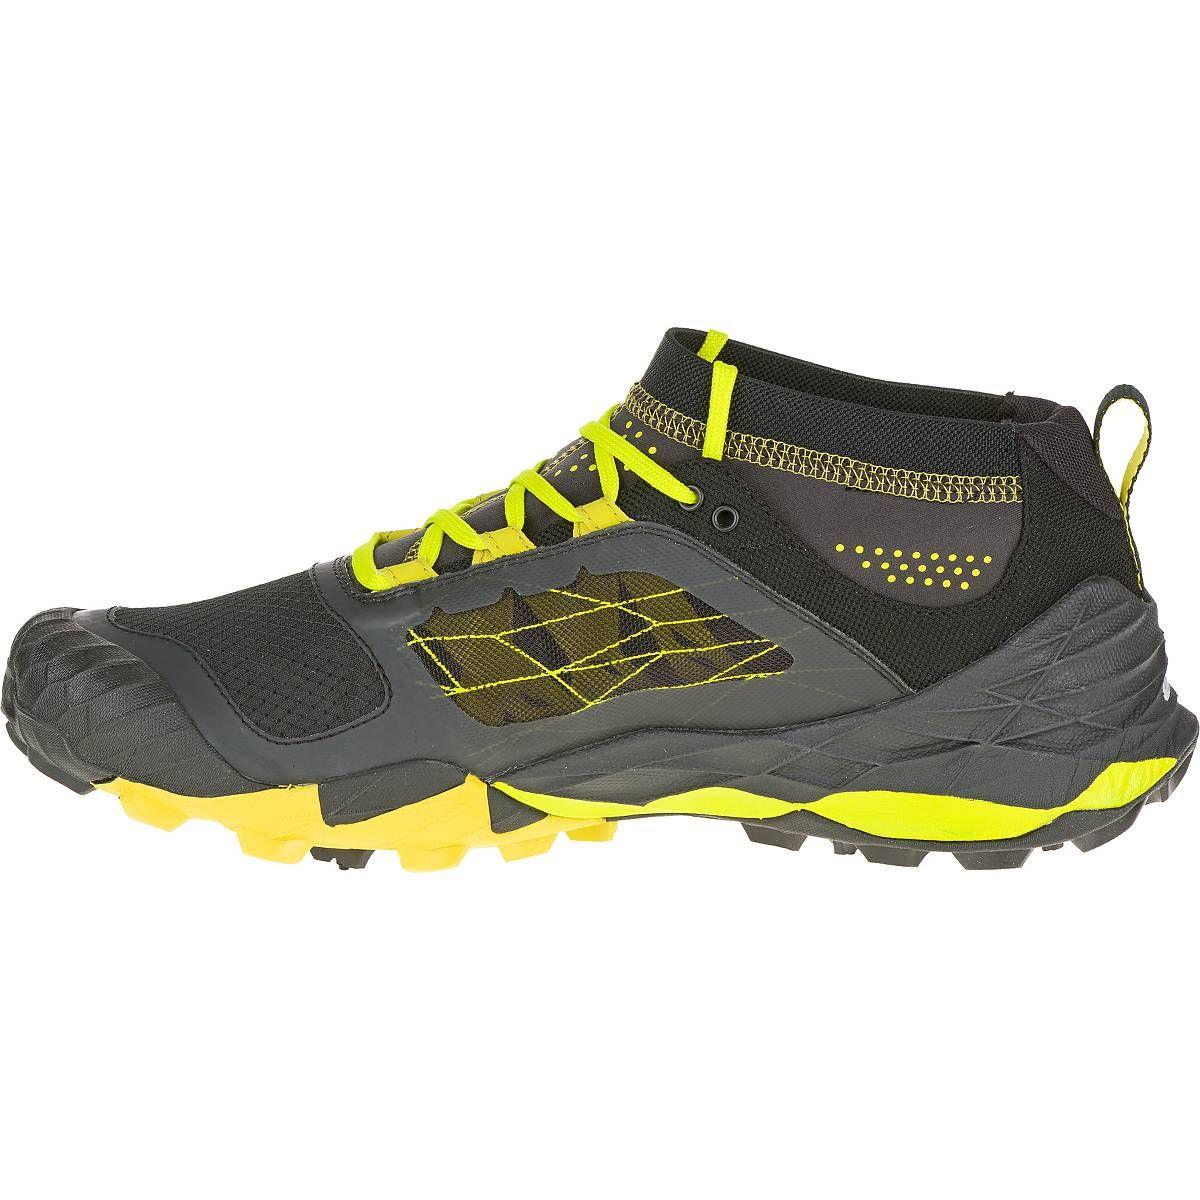 Merrel Trail Running Shoes Men